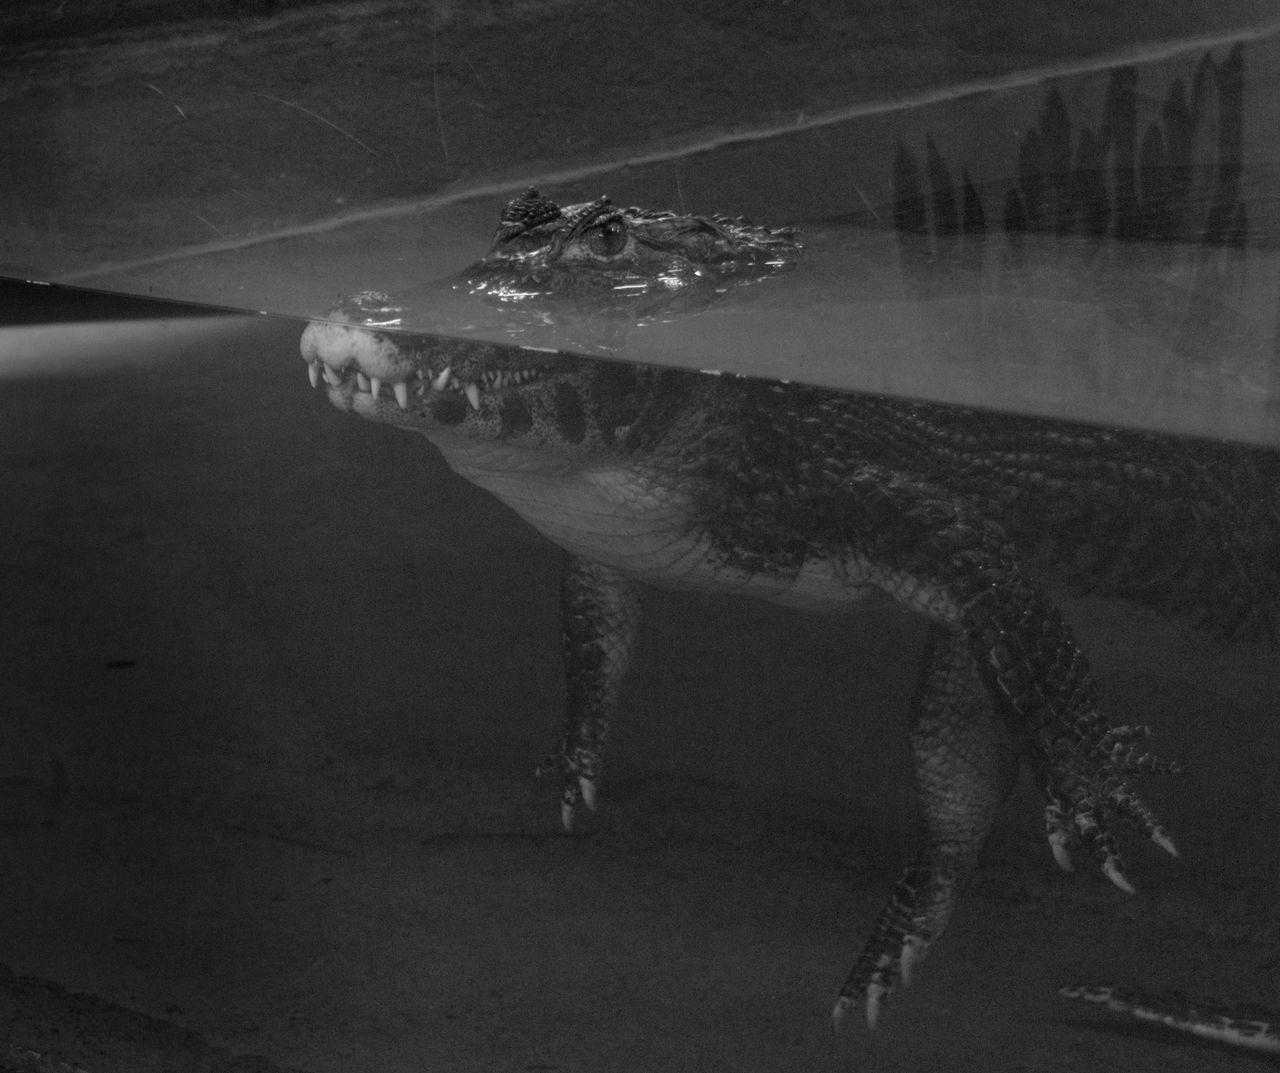 animal, animal themes, one animal, animal wildlife, animals in the wild, water, vertebrate, reptile, sea, swimming, underwater, no people, nature, marine, sea life, turtle, close-up, animals in captivity, outdoors